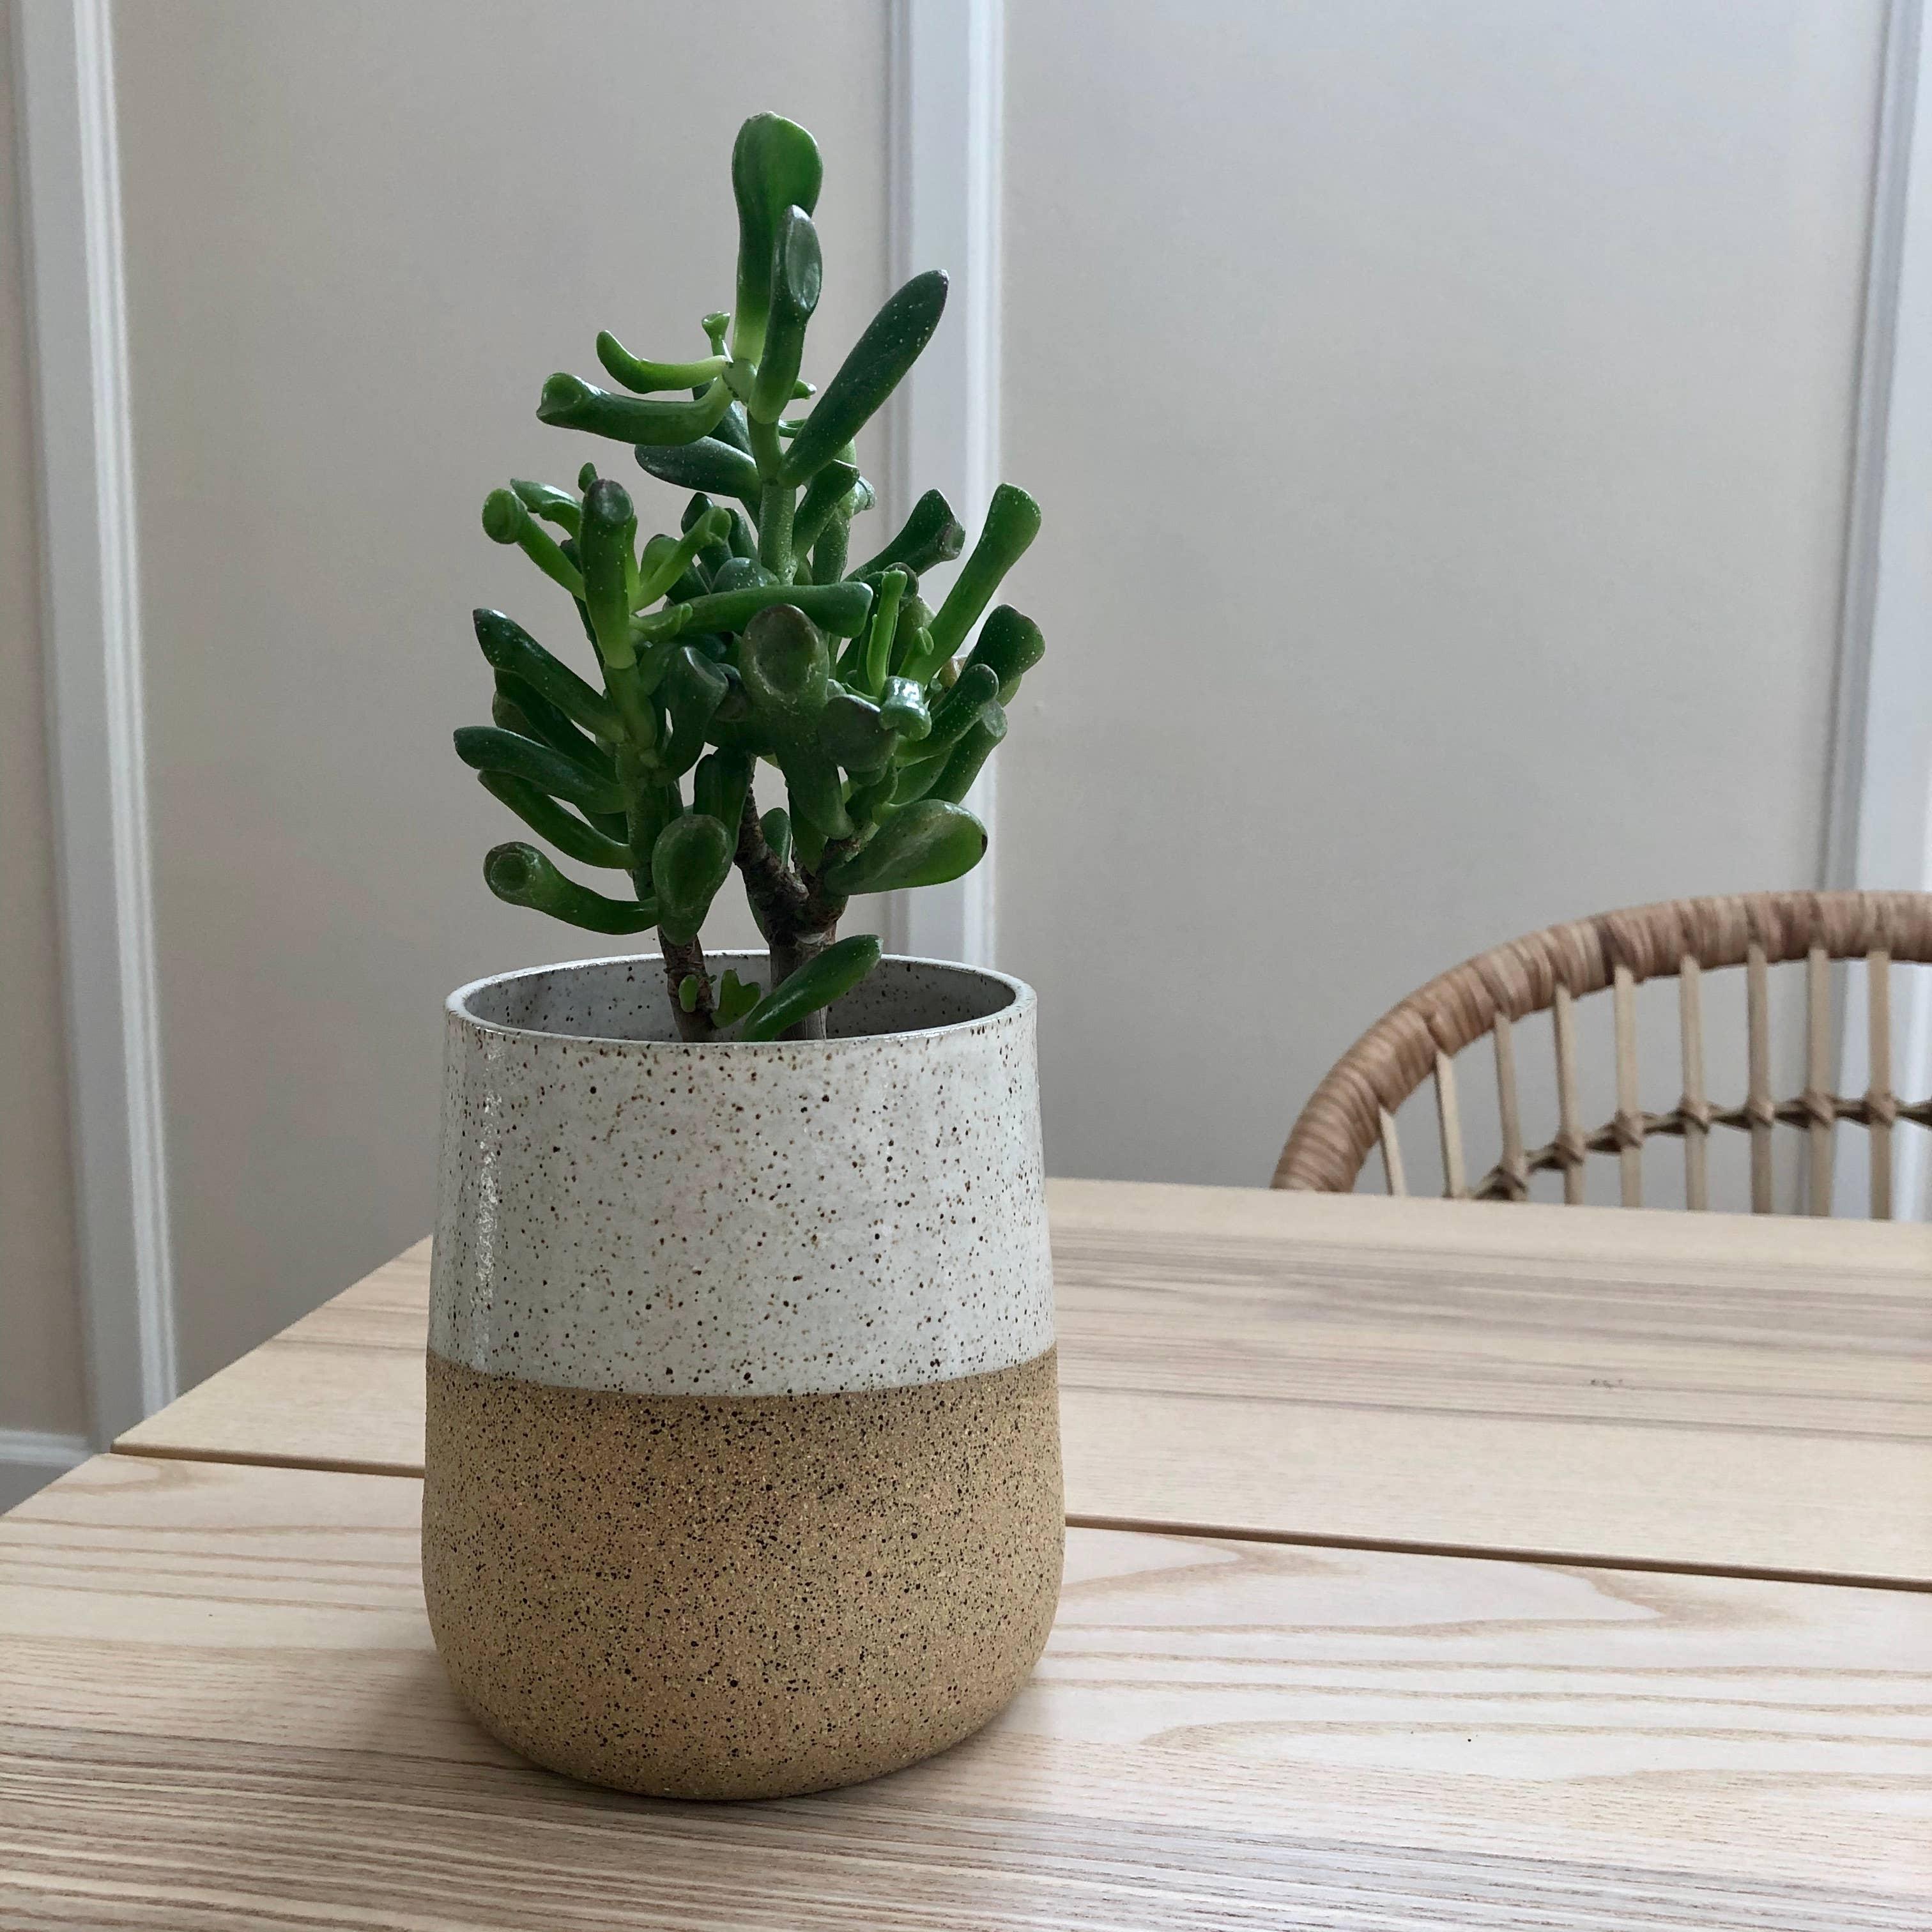 Form no.2 Speckled Planter